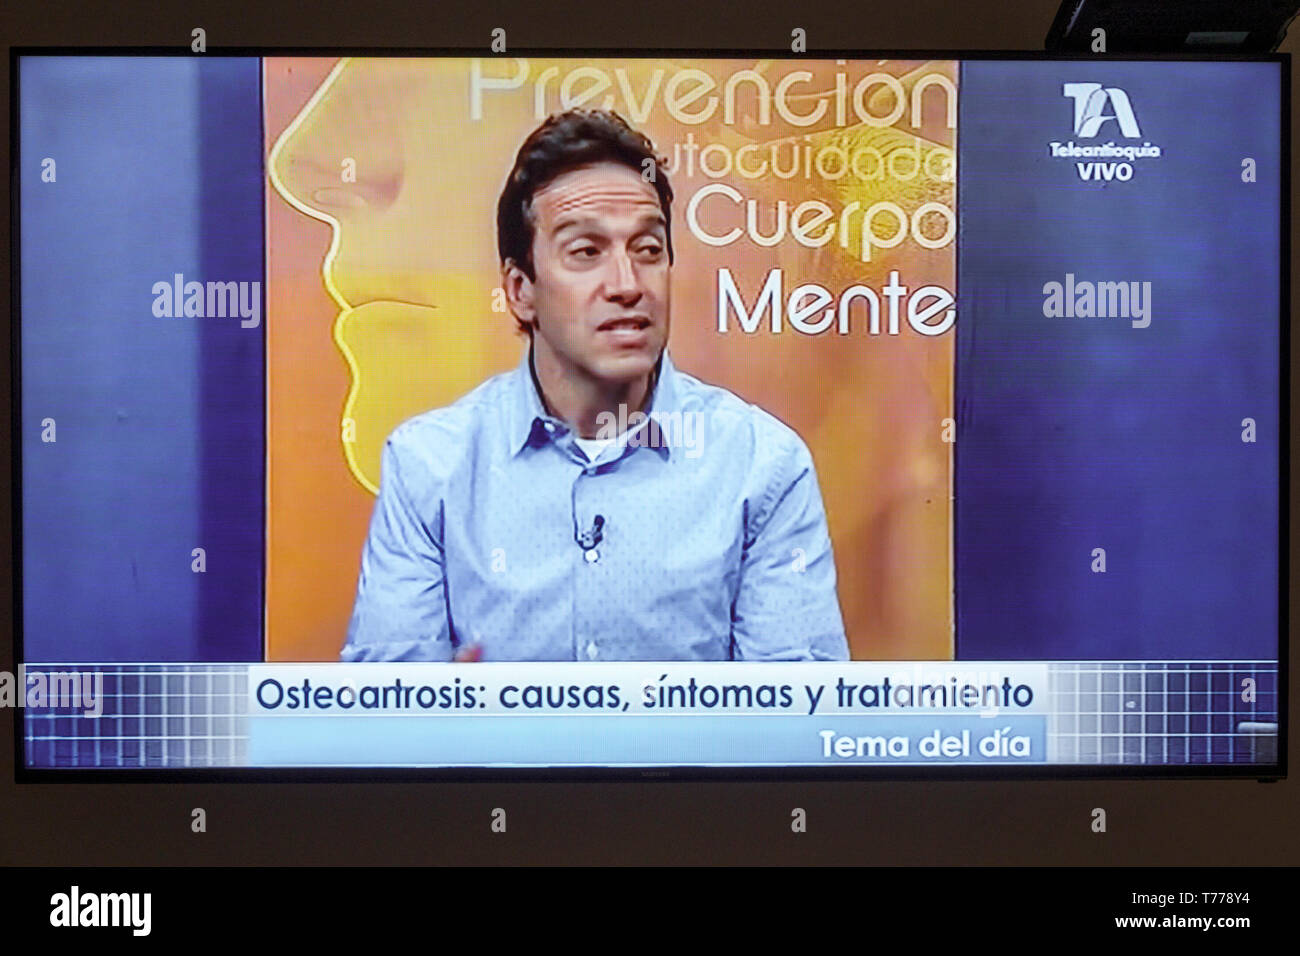 Cartagena Colombia TV television monitor screen flat screen medical program Spanish language osteoarthritis telemarketing Hispanic man - Stock Image